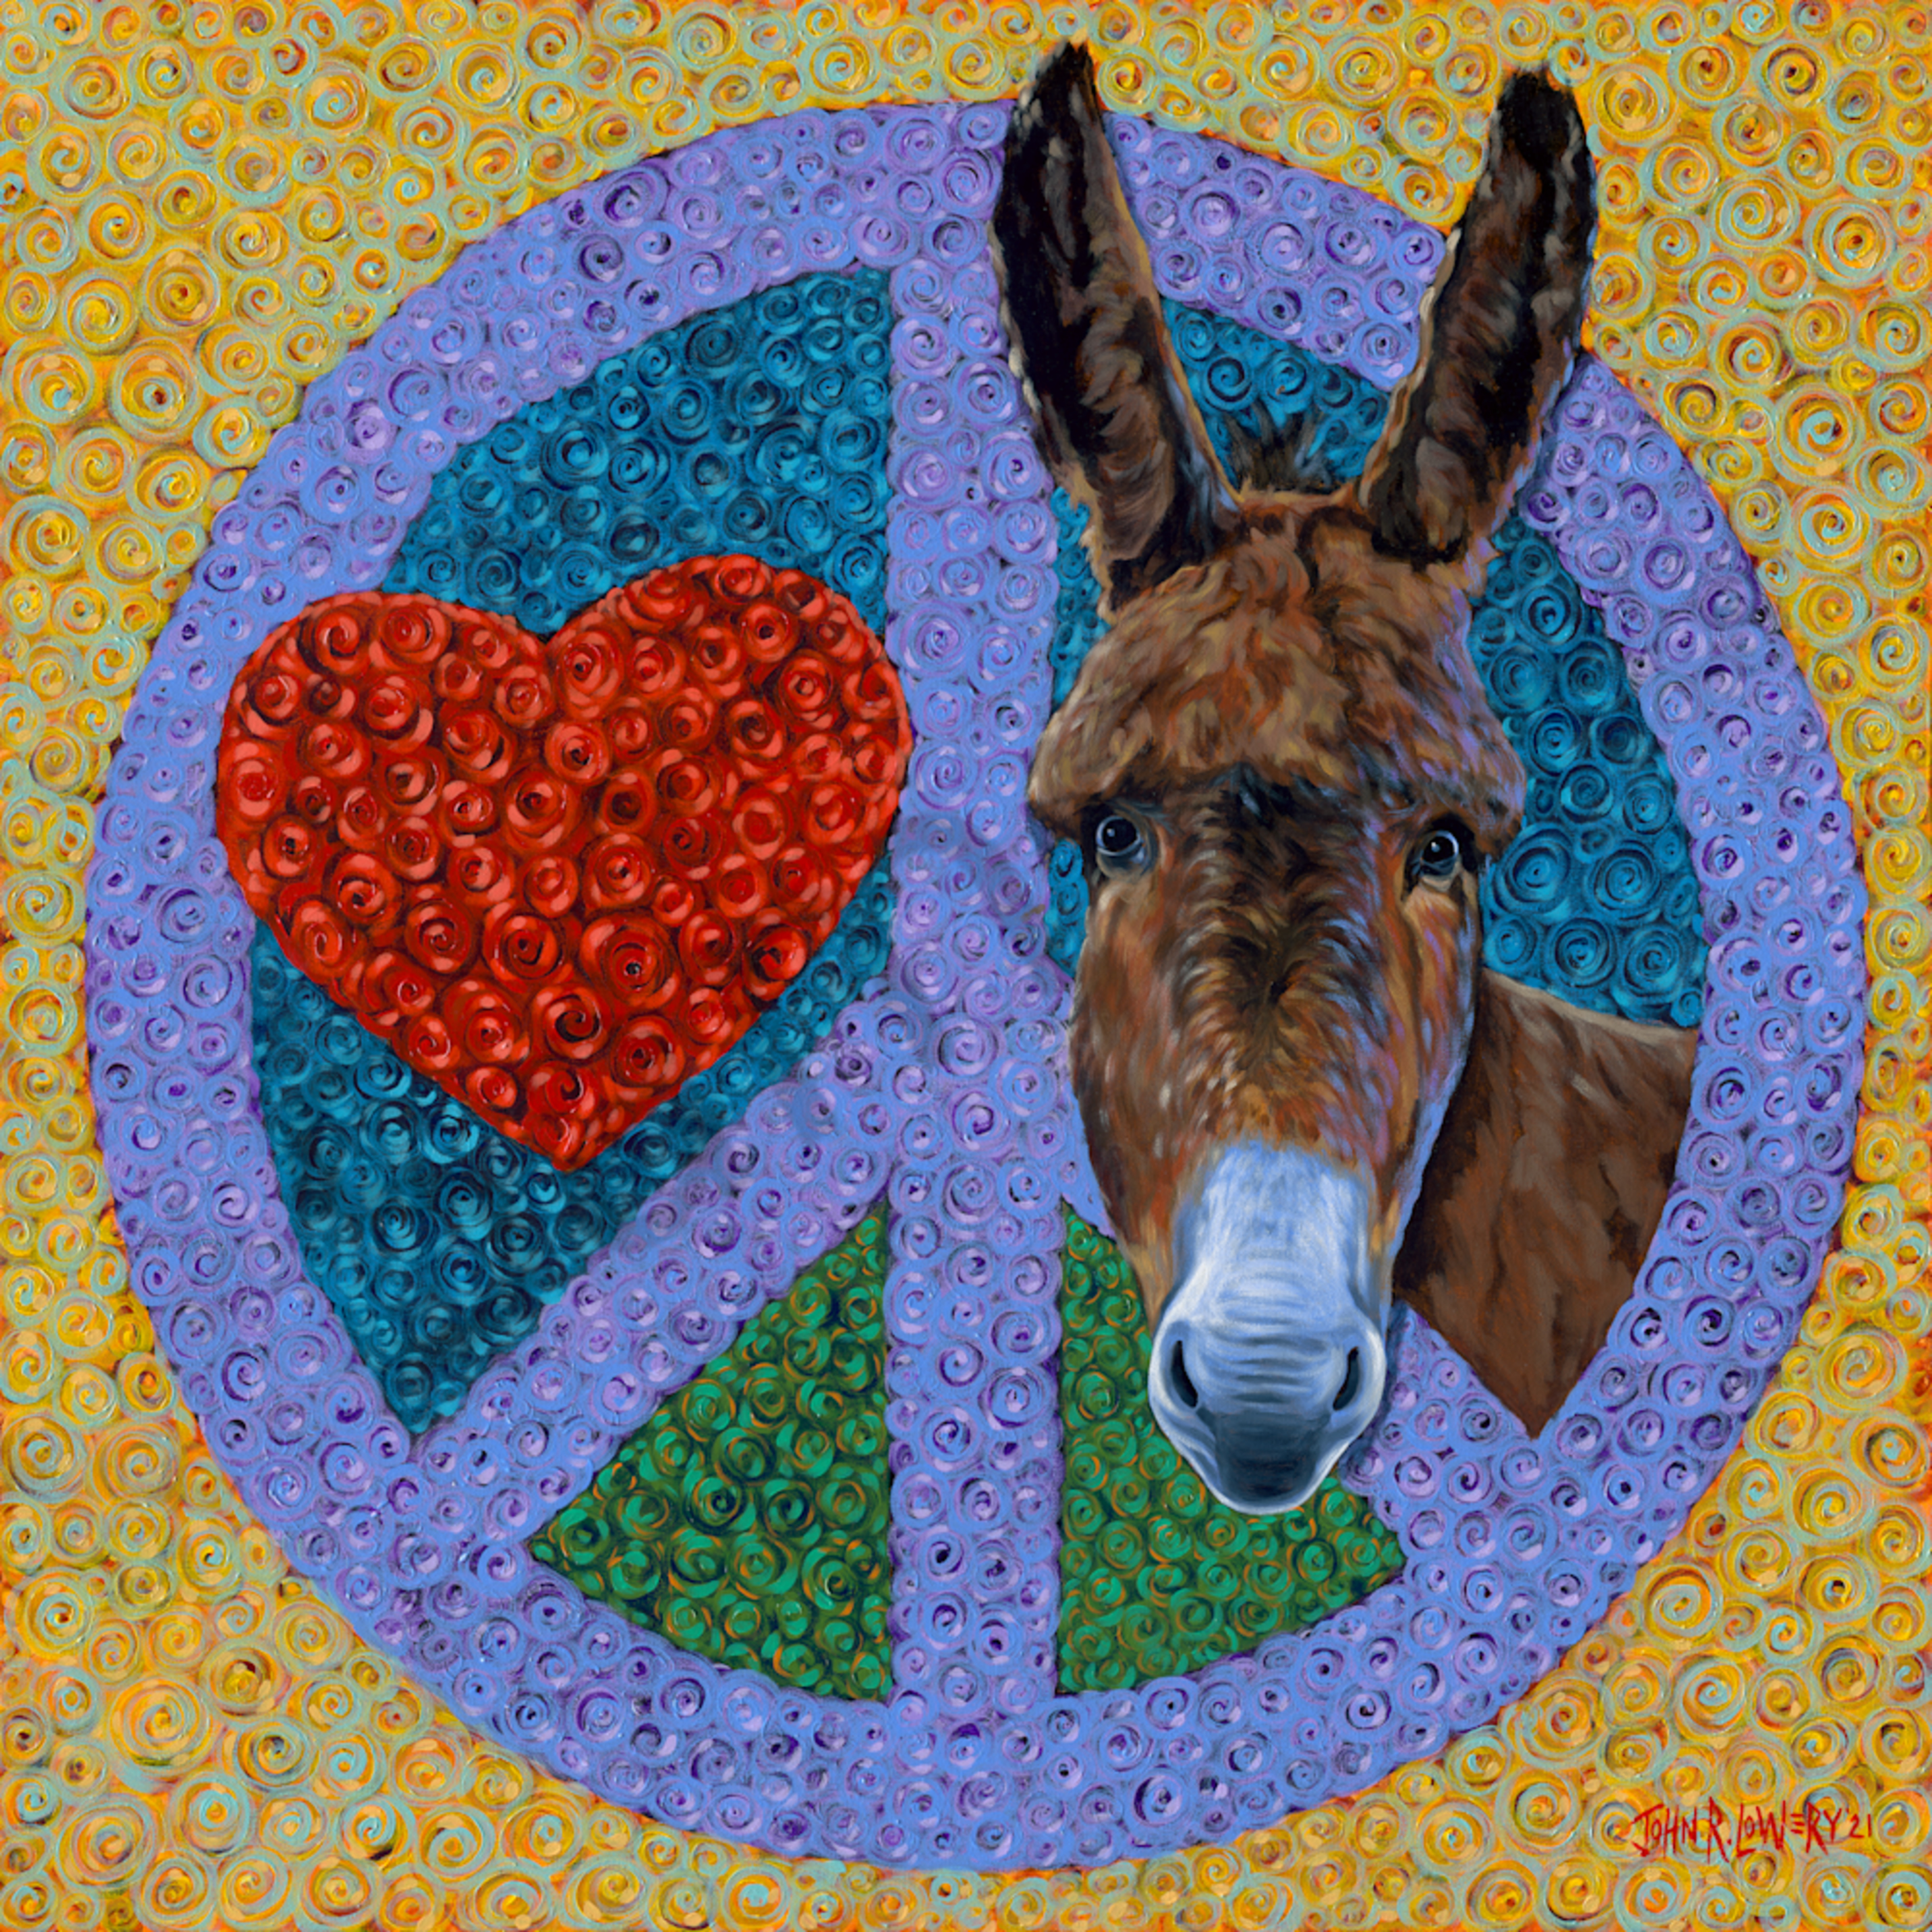 Asf   150dpipeace love donkey yfcblh